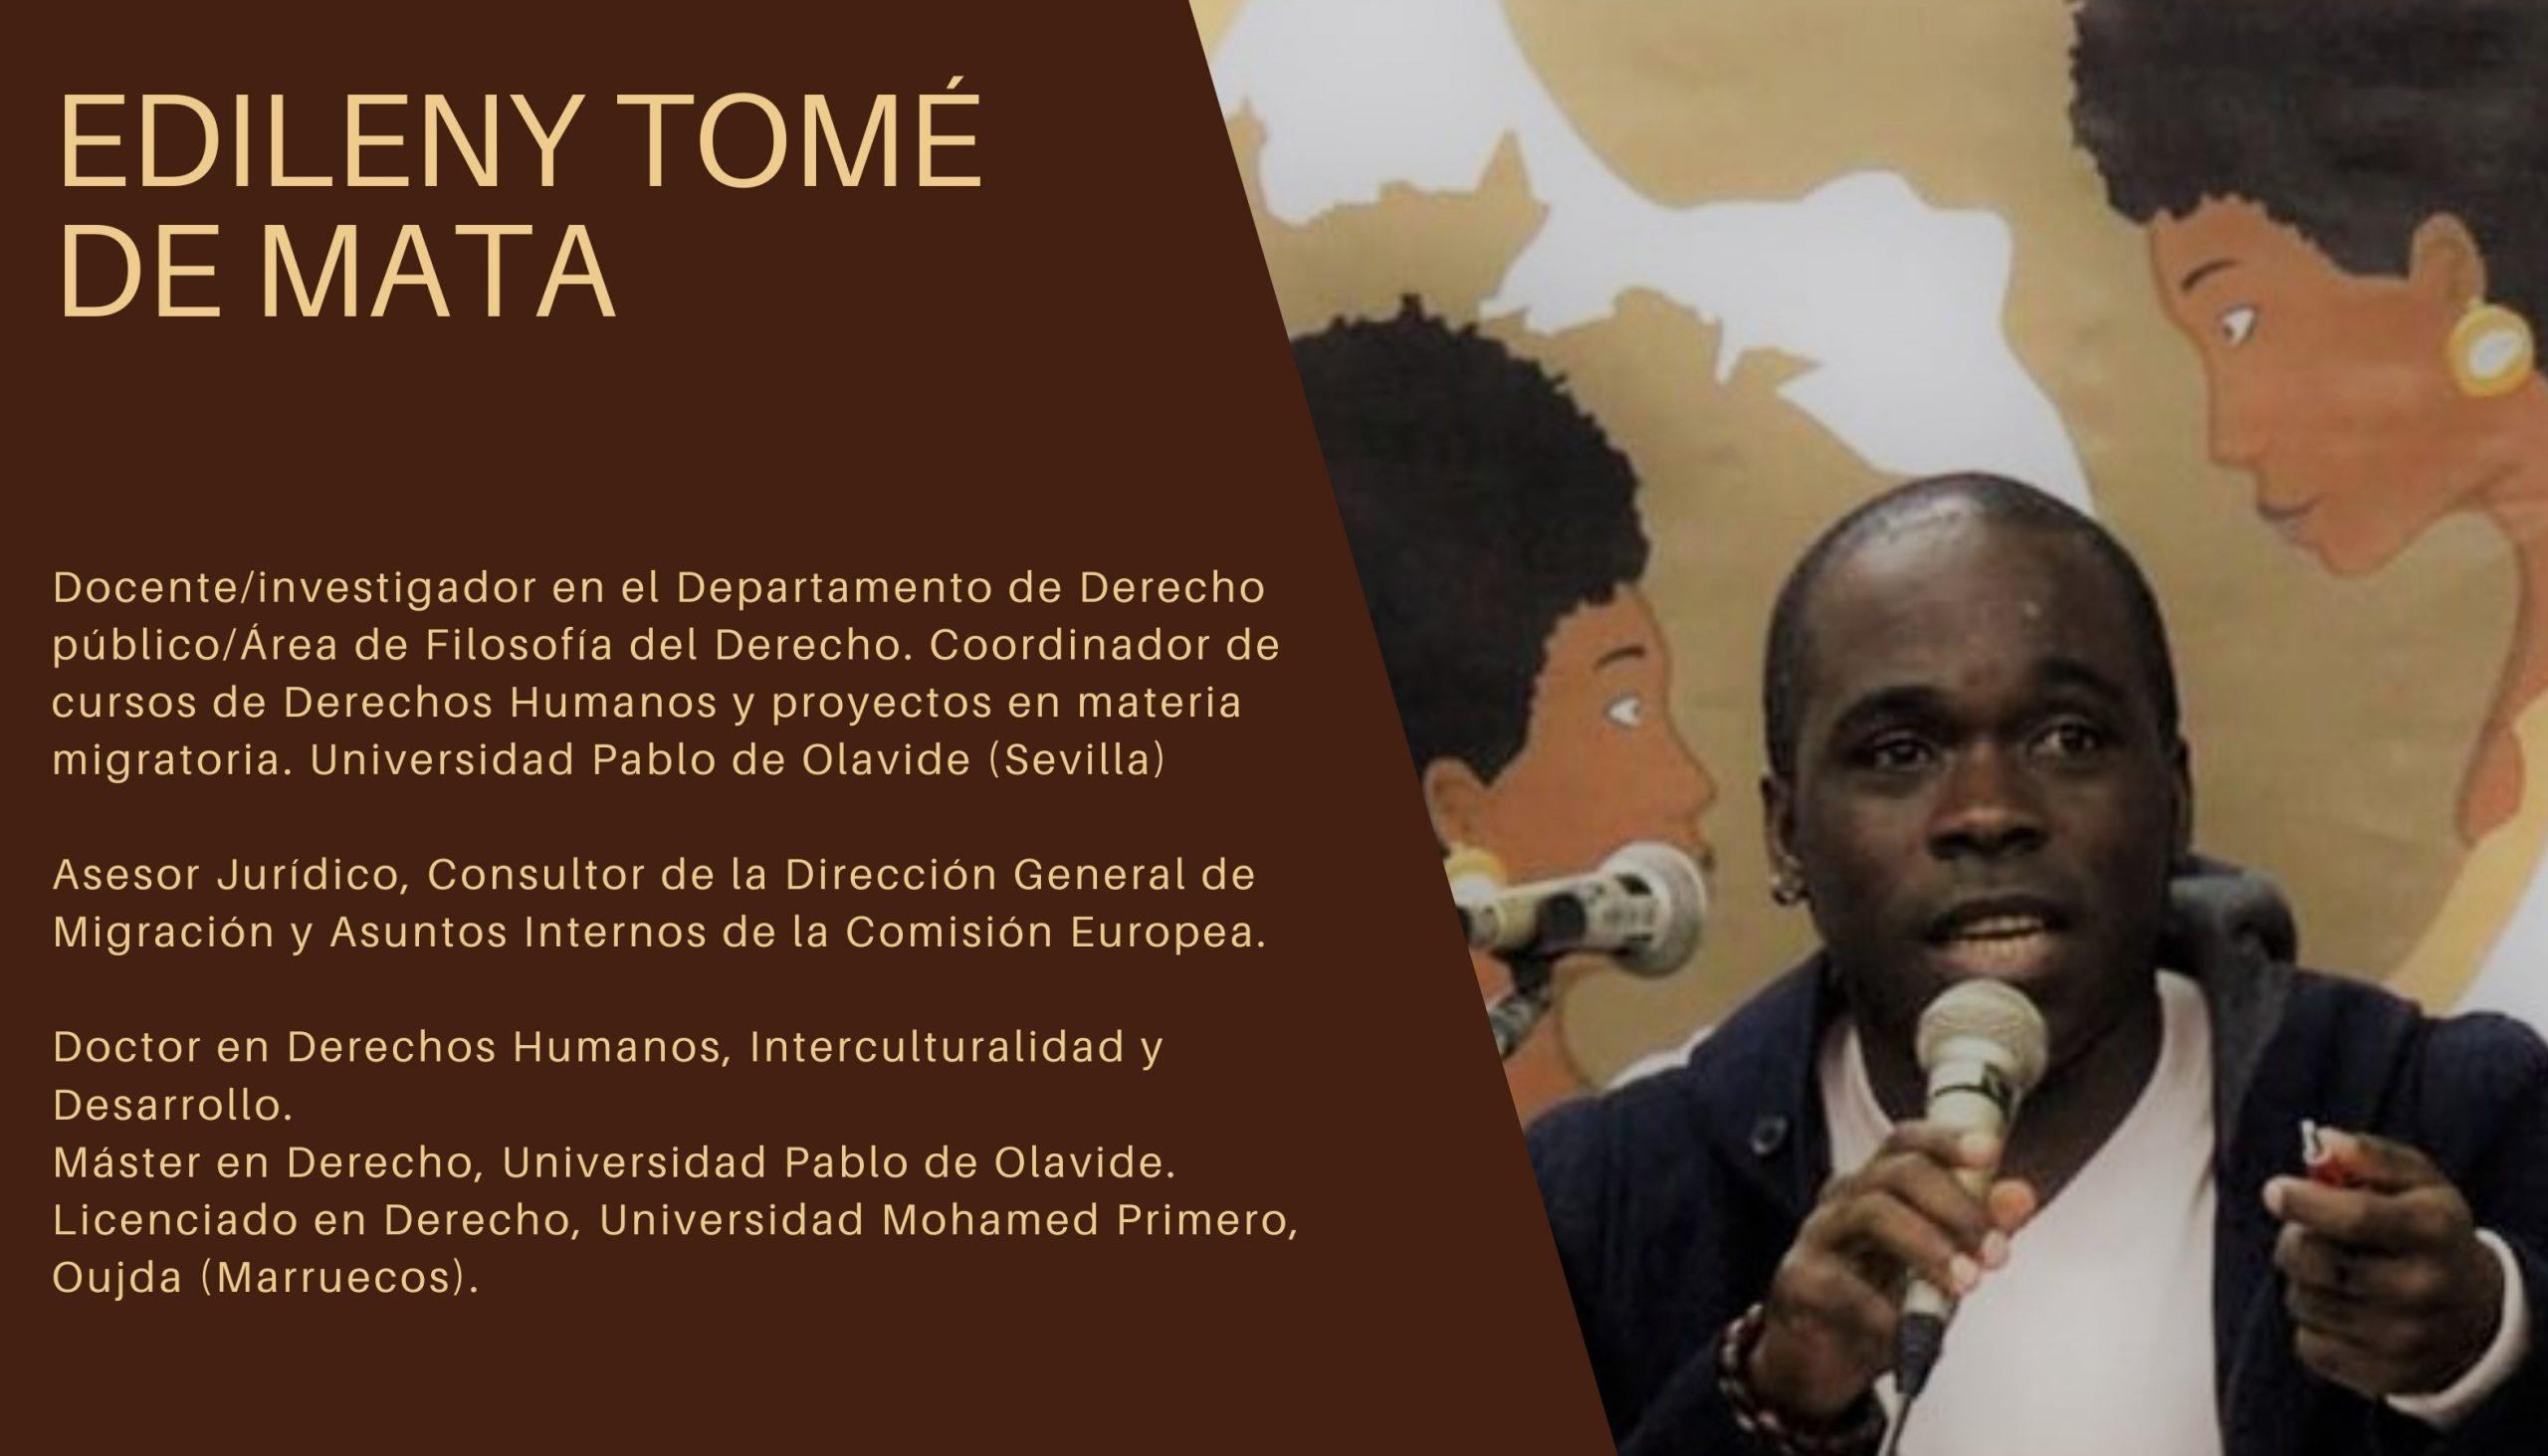 Edileny_Tome_Da_Mata_presentacion